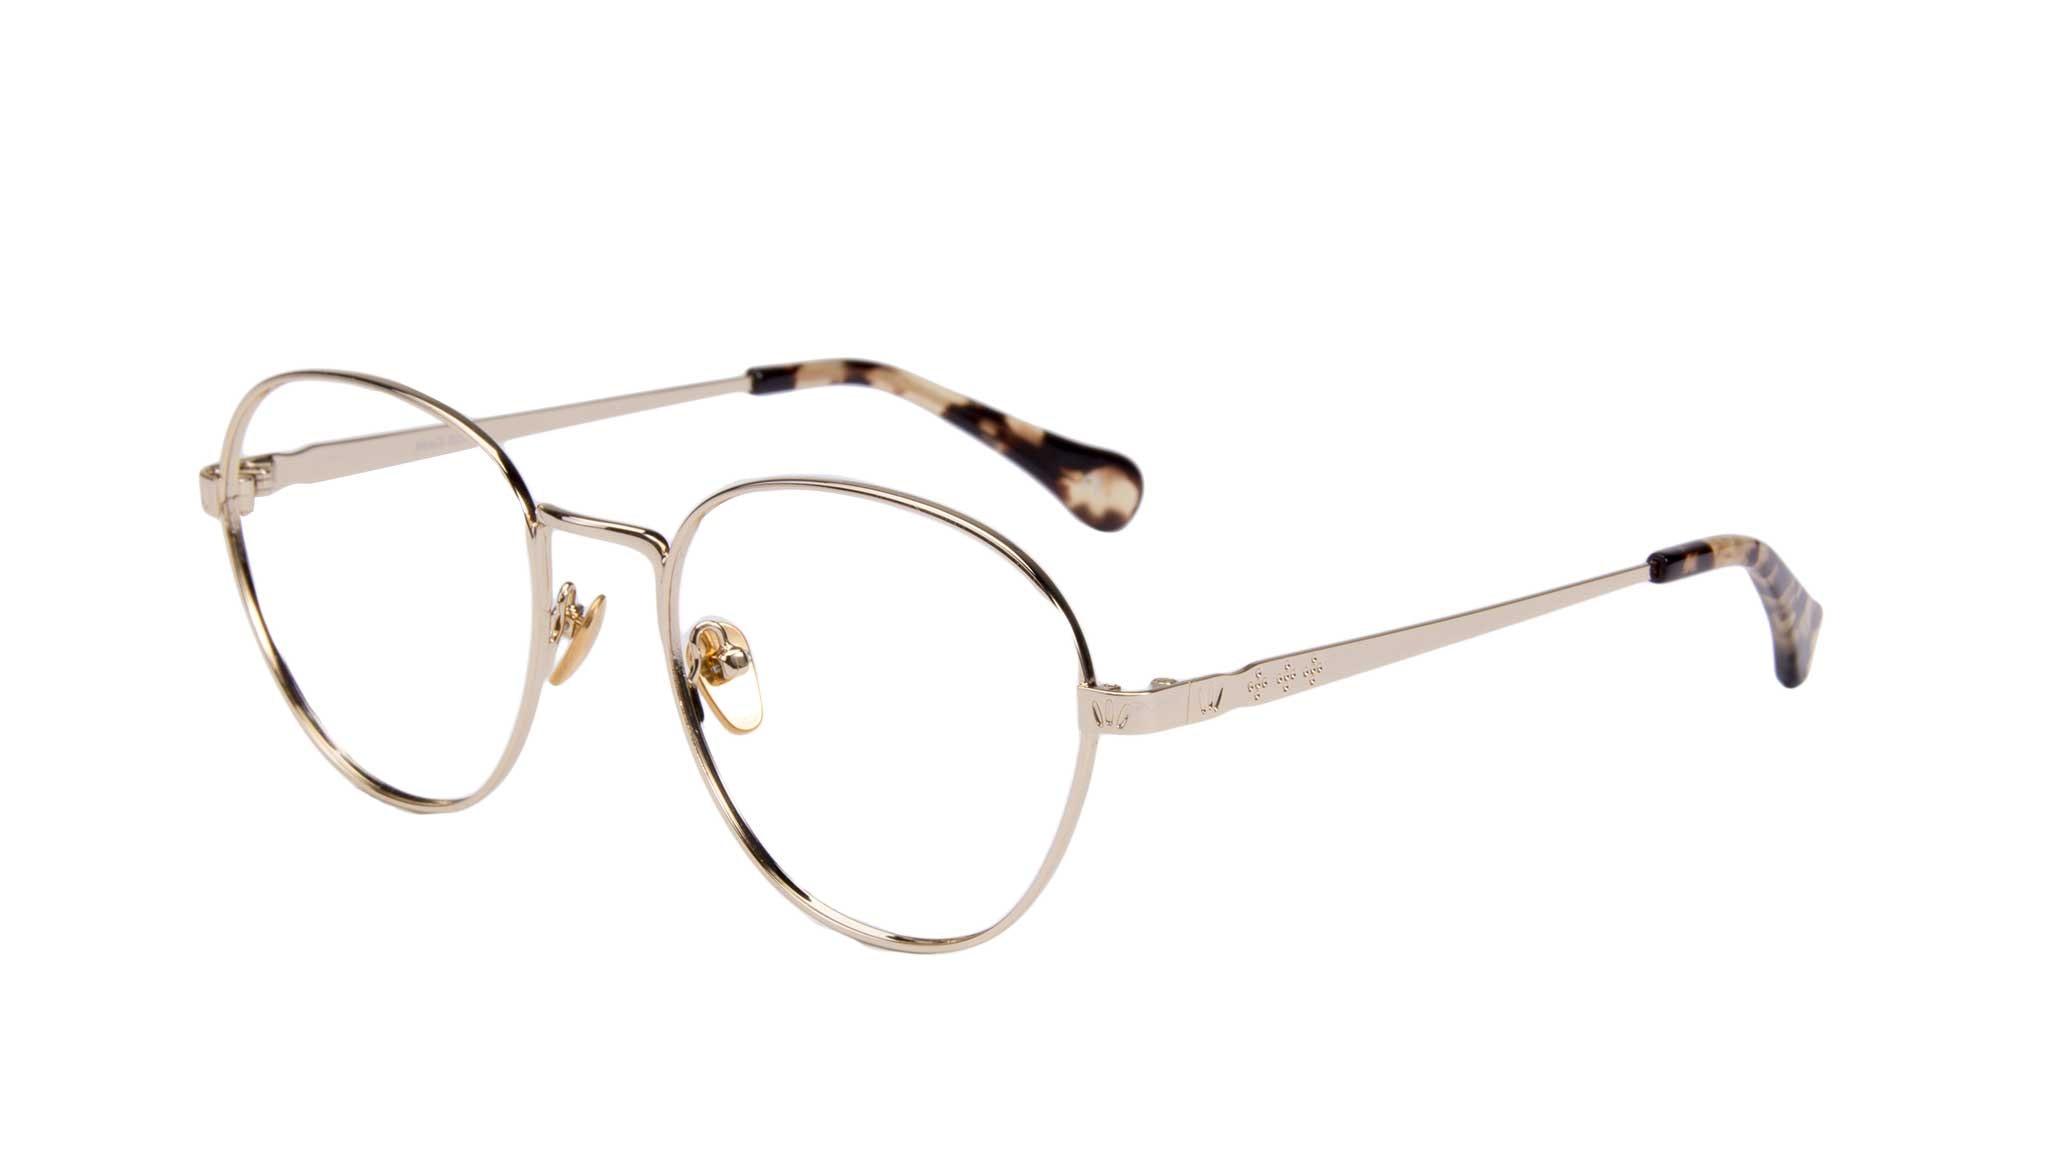 Affordable Fashion Glasses Round Eyeglasses Women Brace gold Tilt